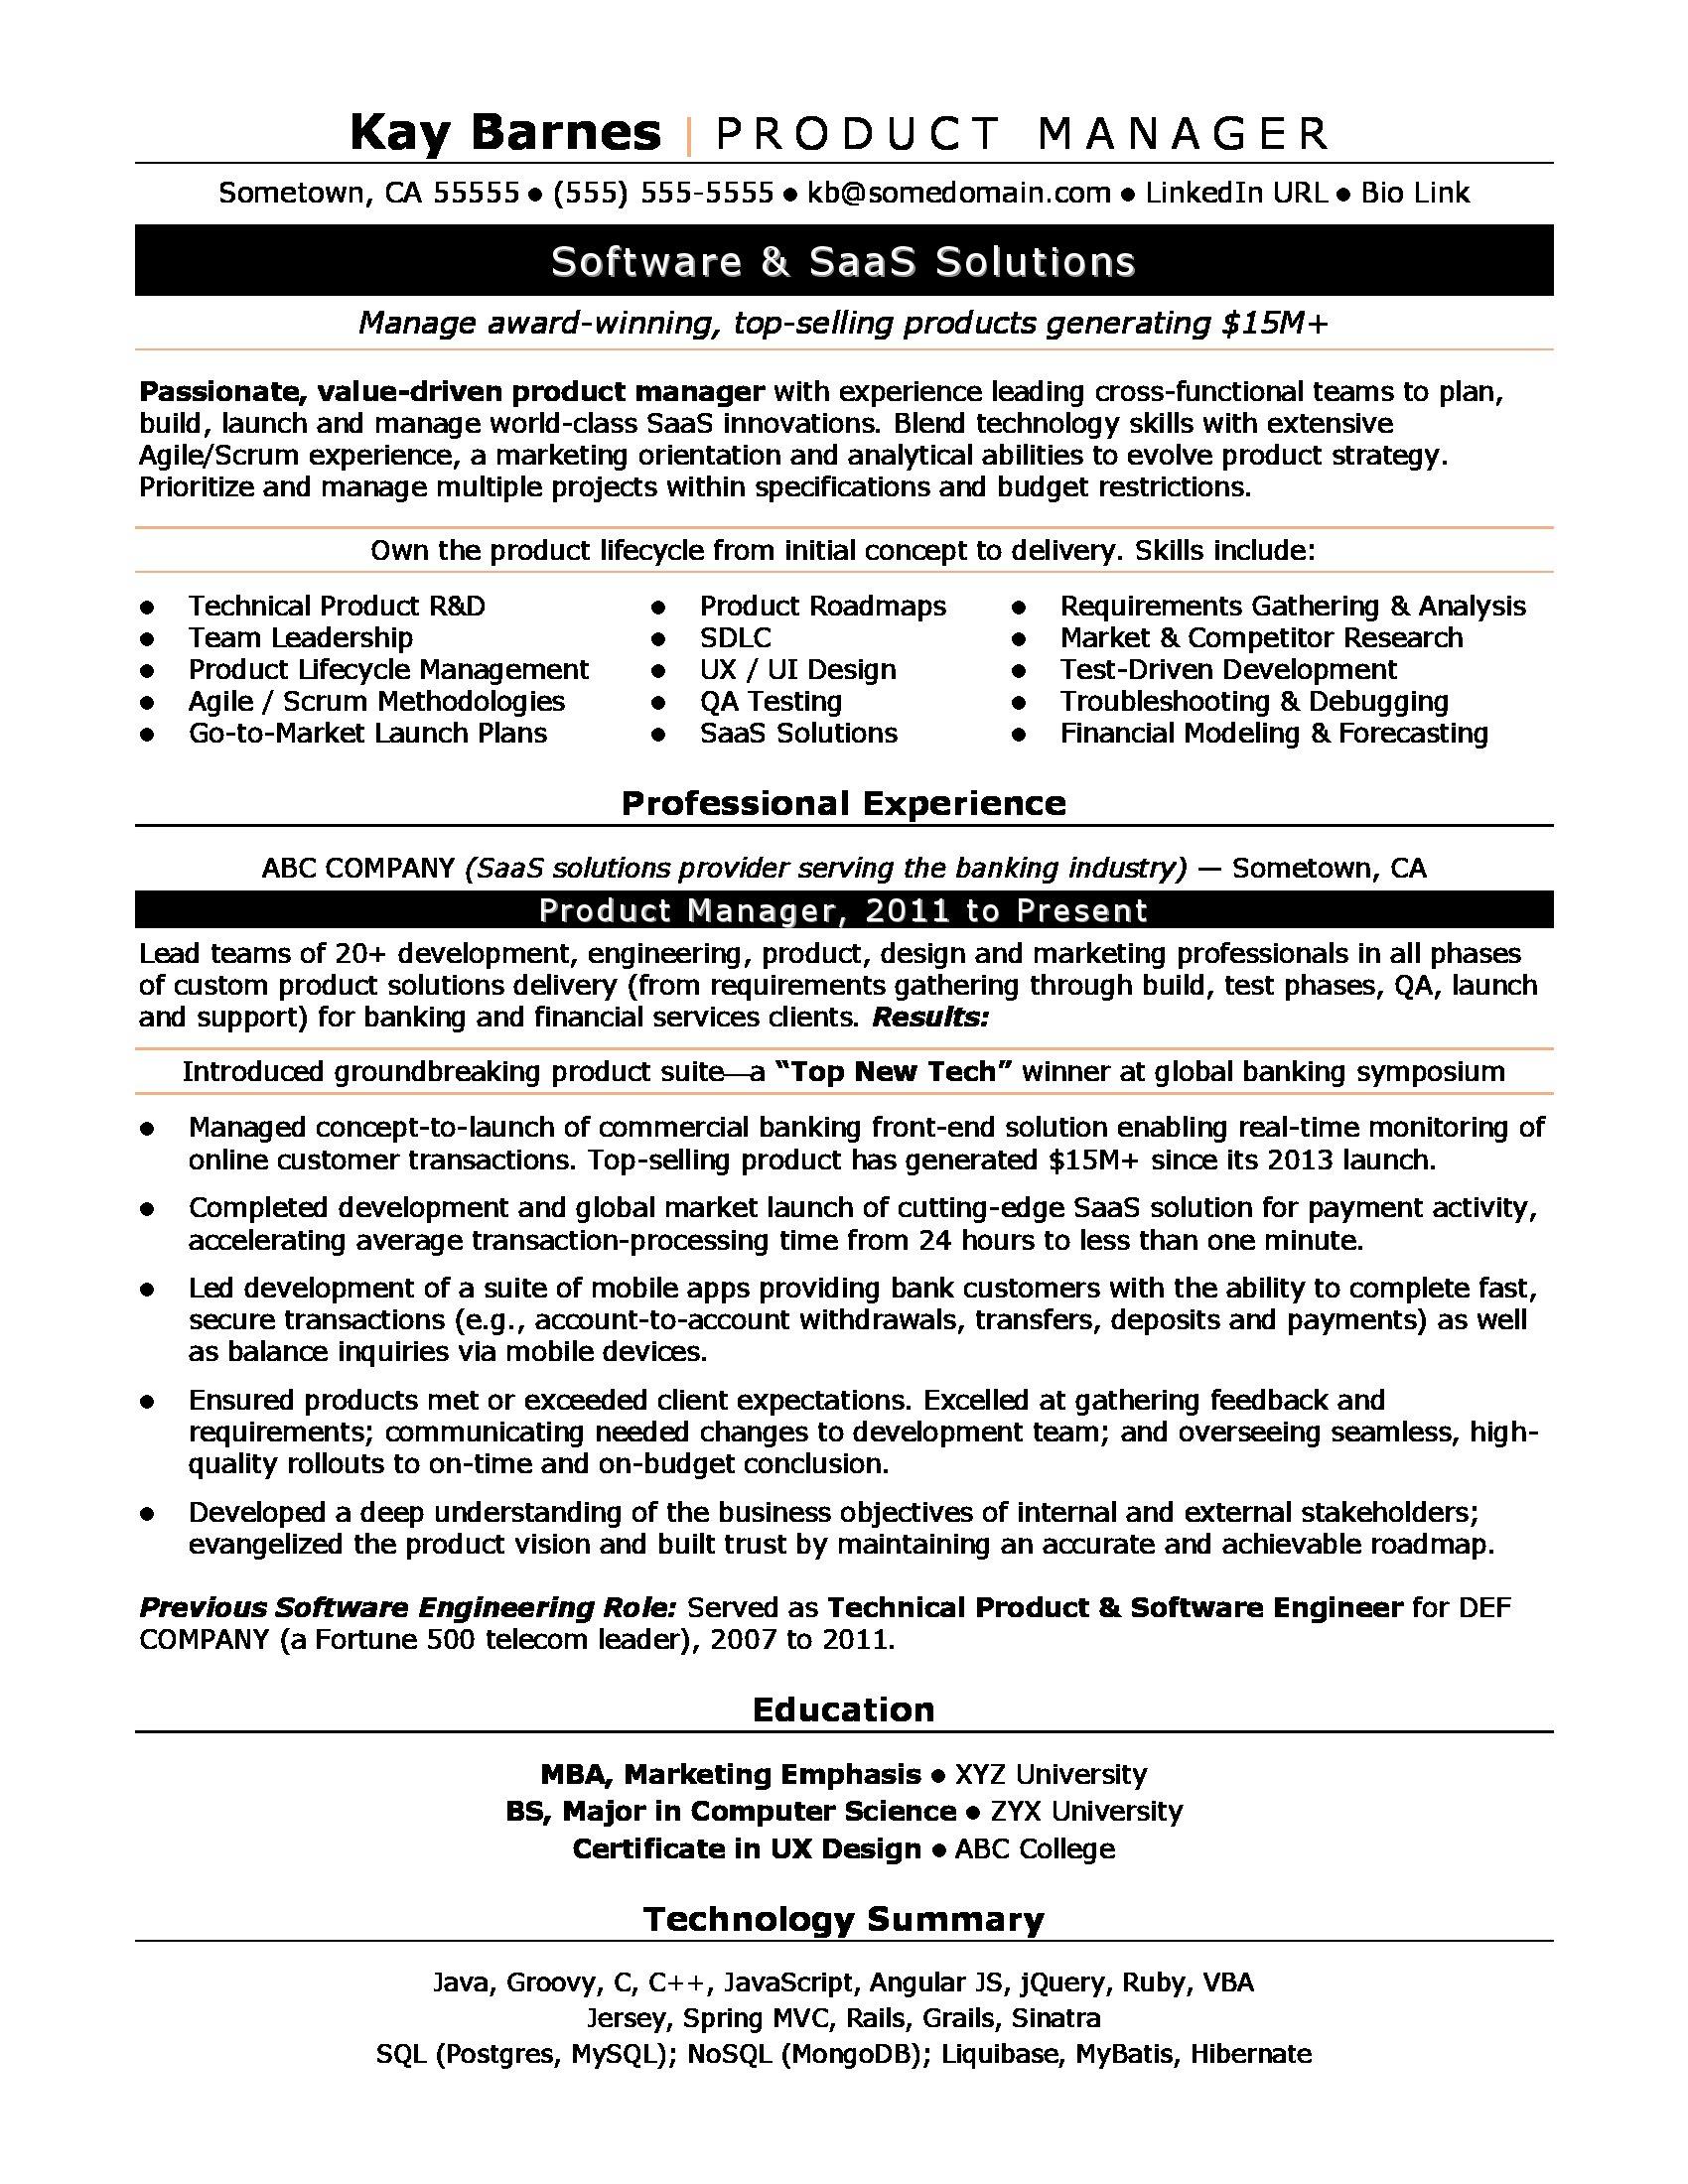 Mobile Security Engineer Job Description